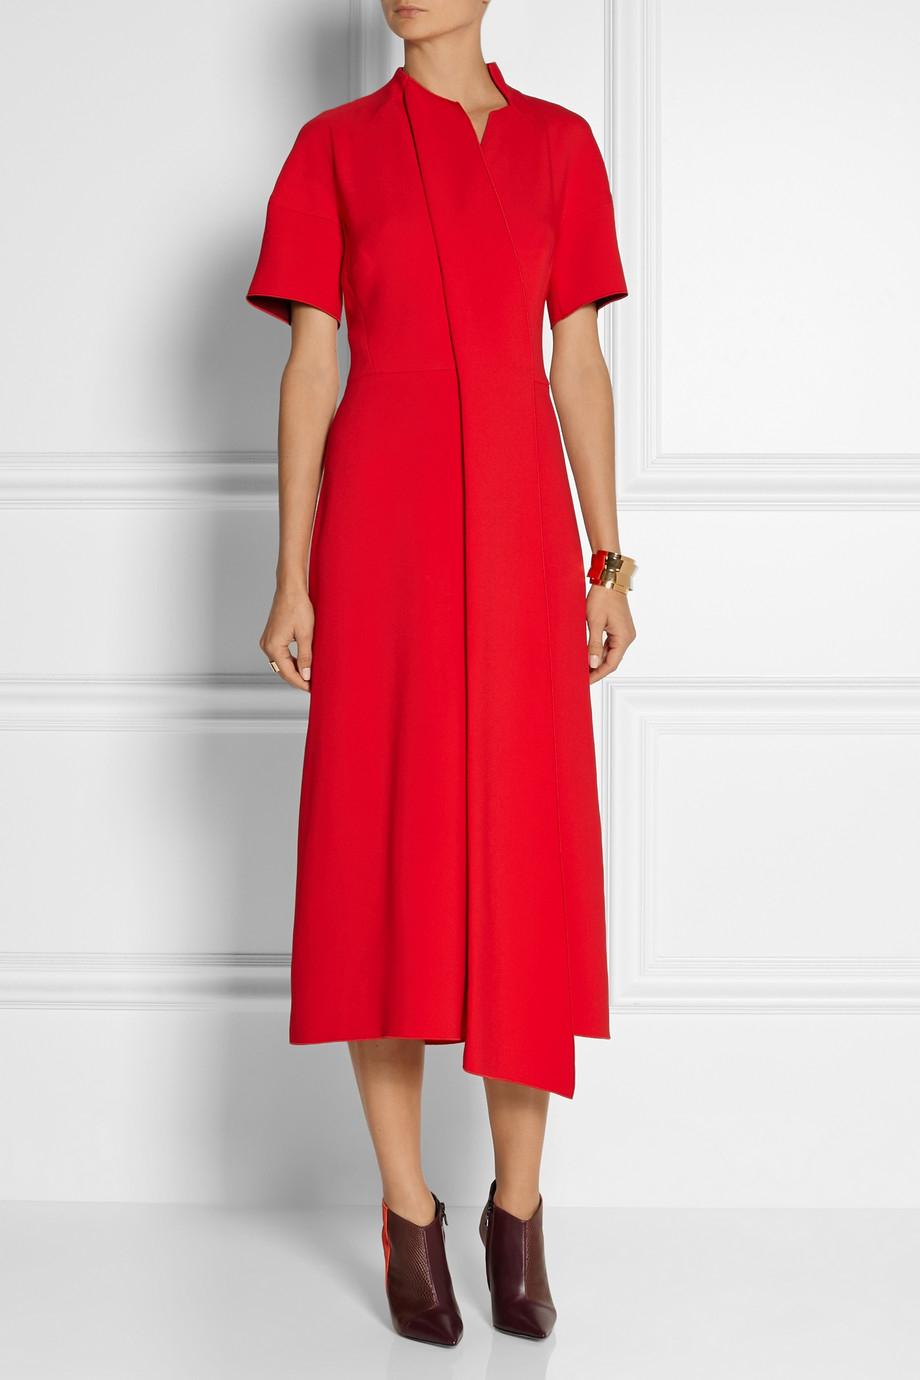 Lyst Victoria Beckham Asymmetric Crepe Midi Dress In Red